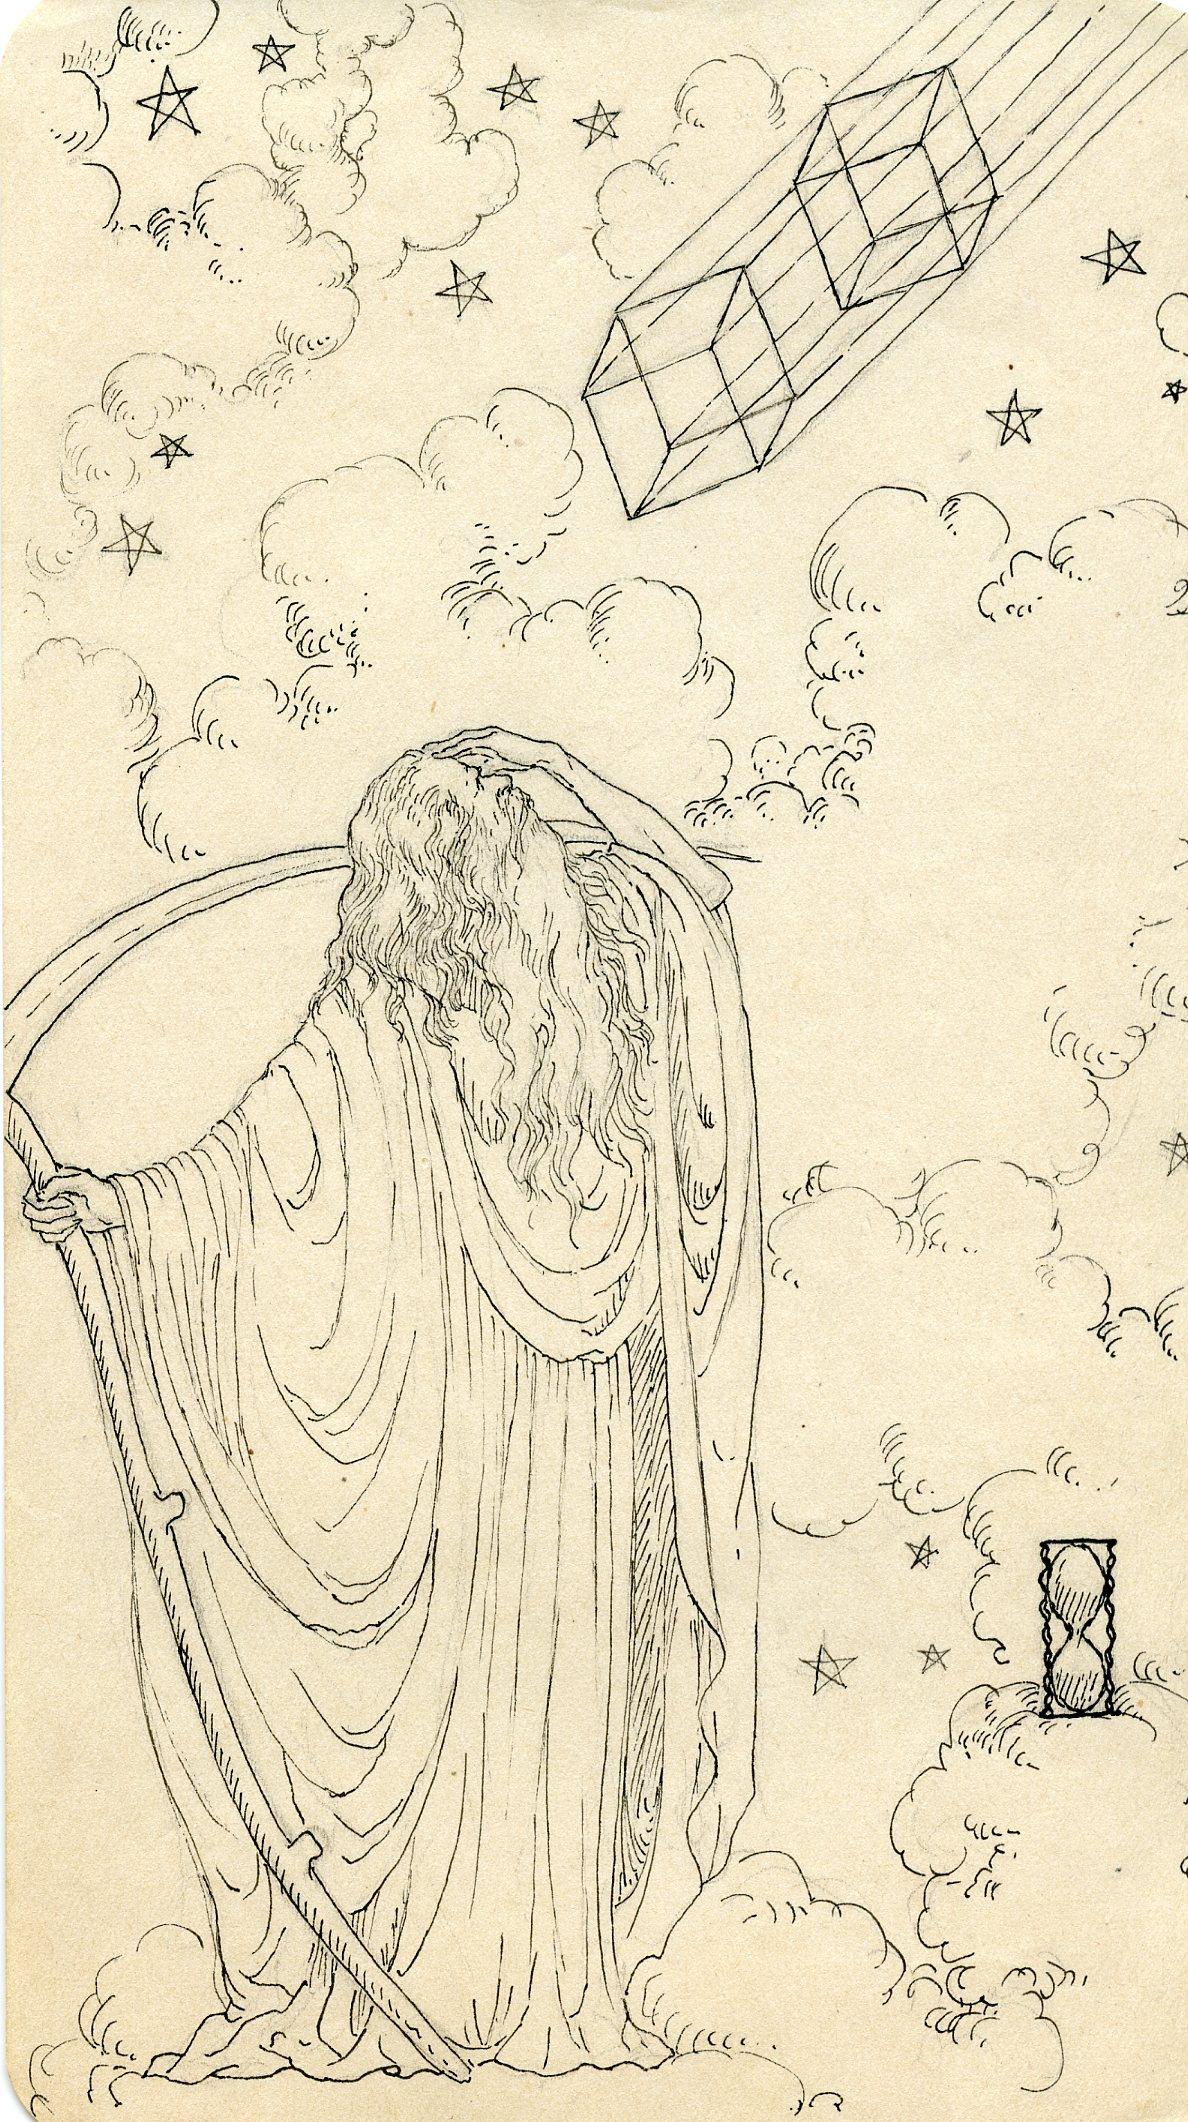 MSB, Illustration, for an essay on Time, 1930's.